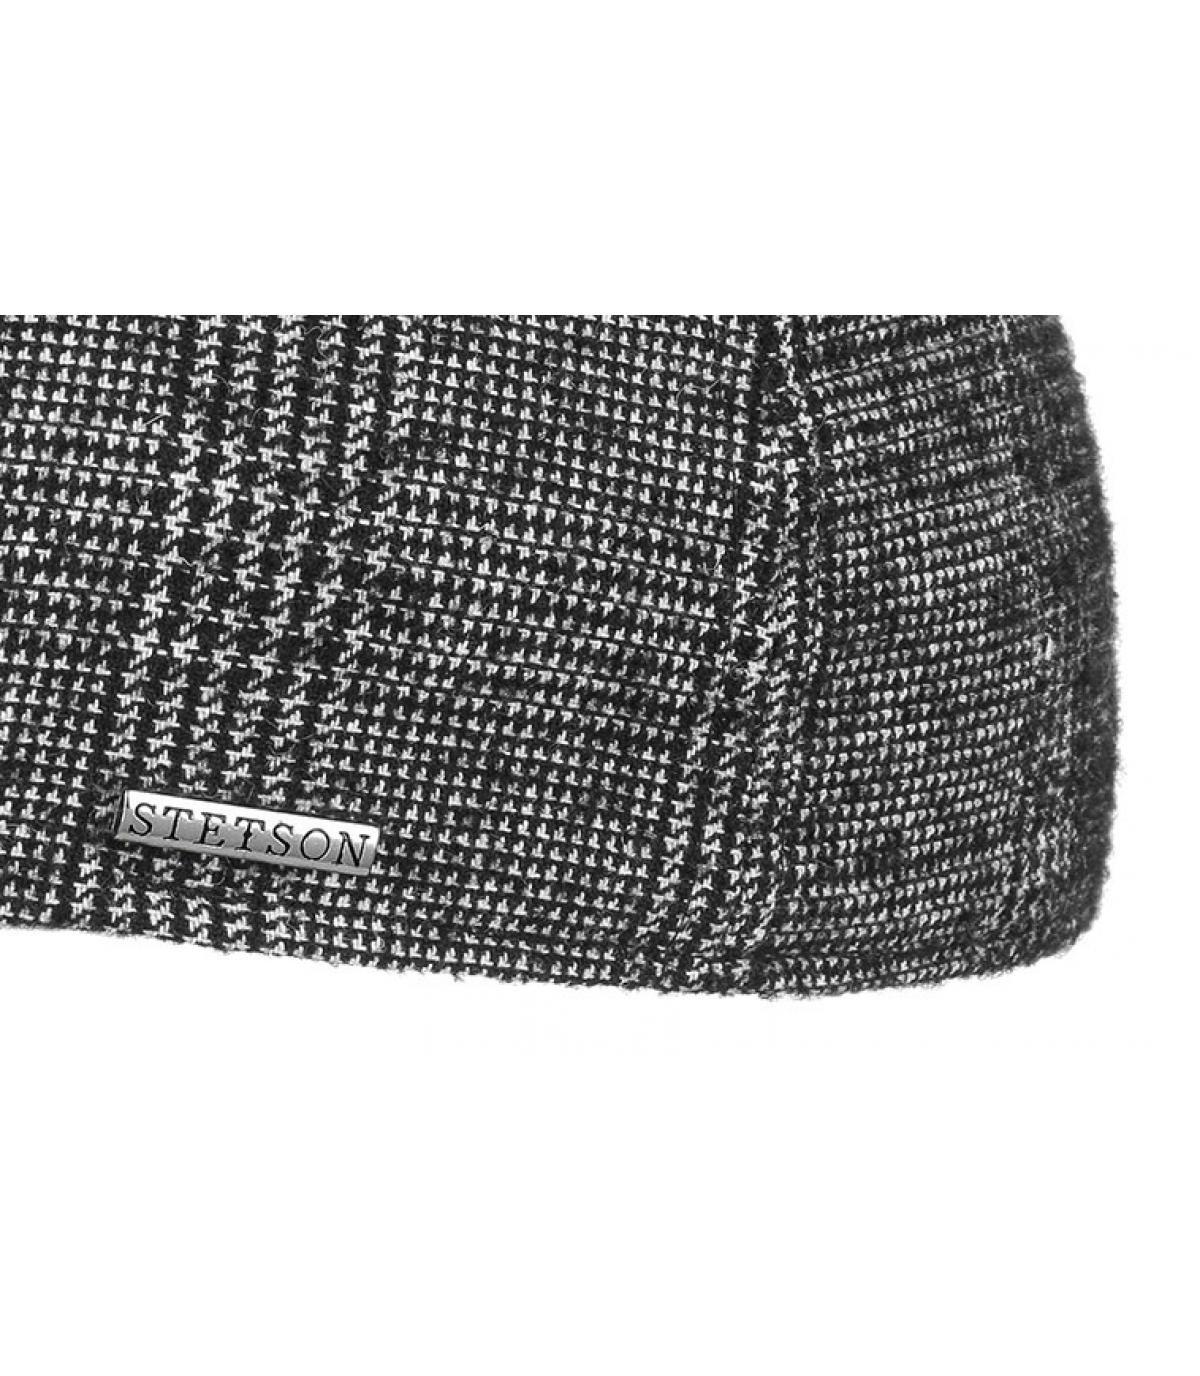 Détails Texas Wool black white check - image 3